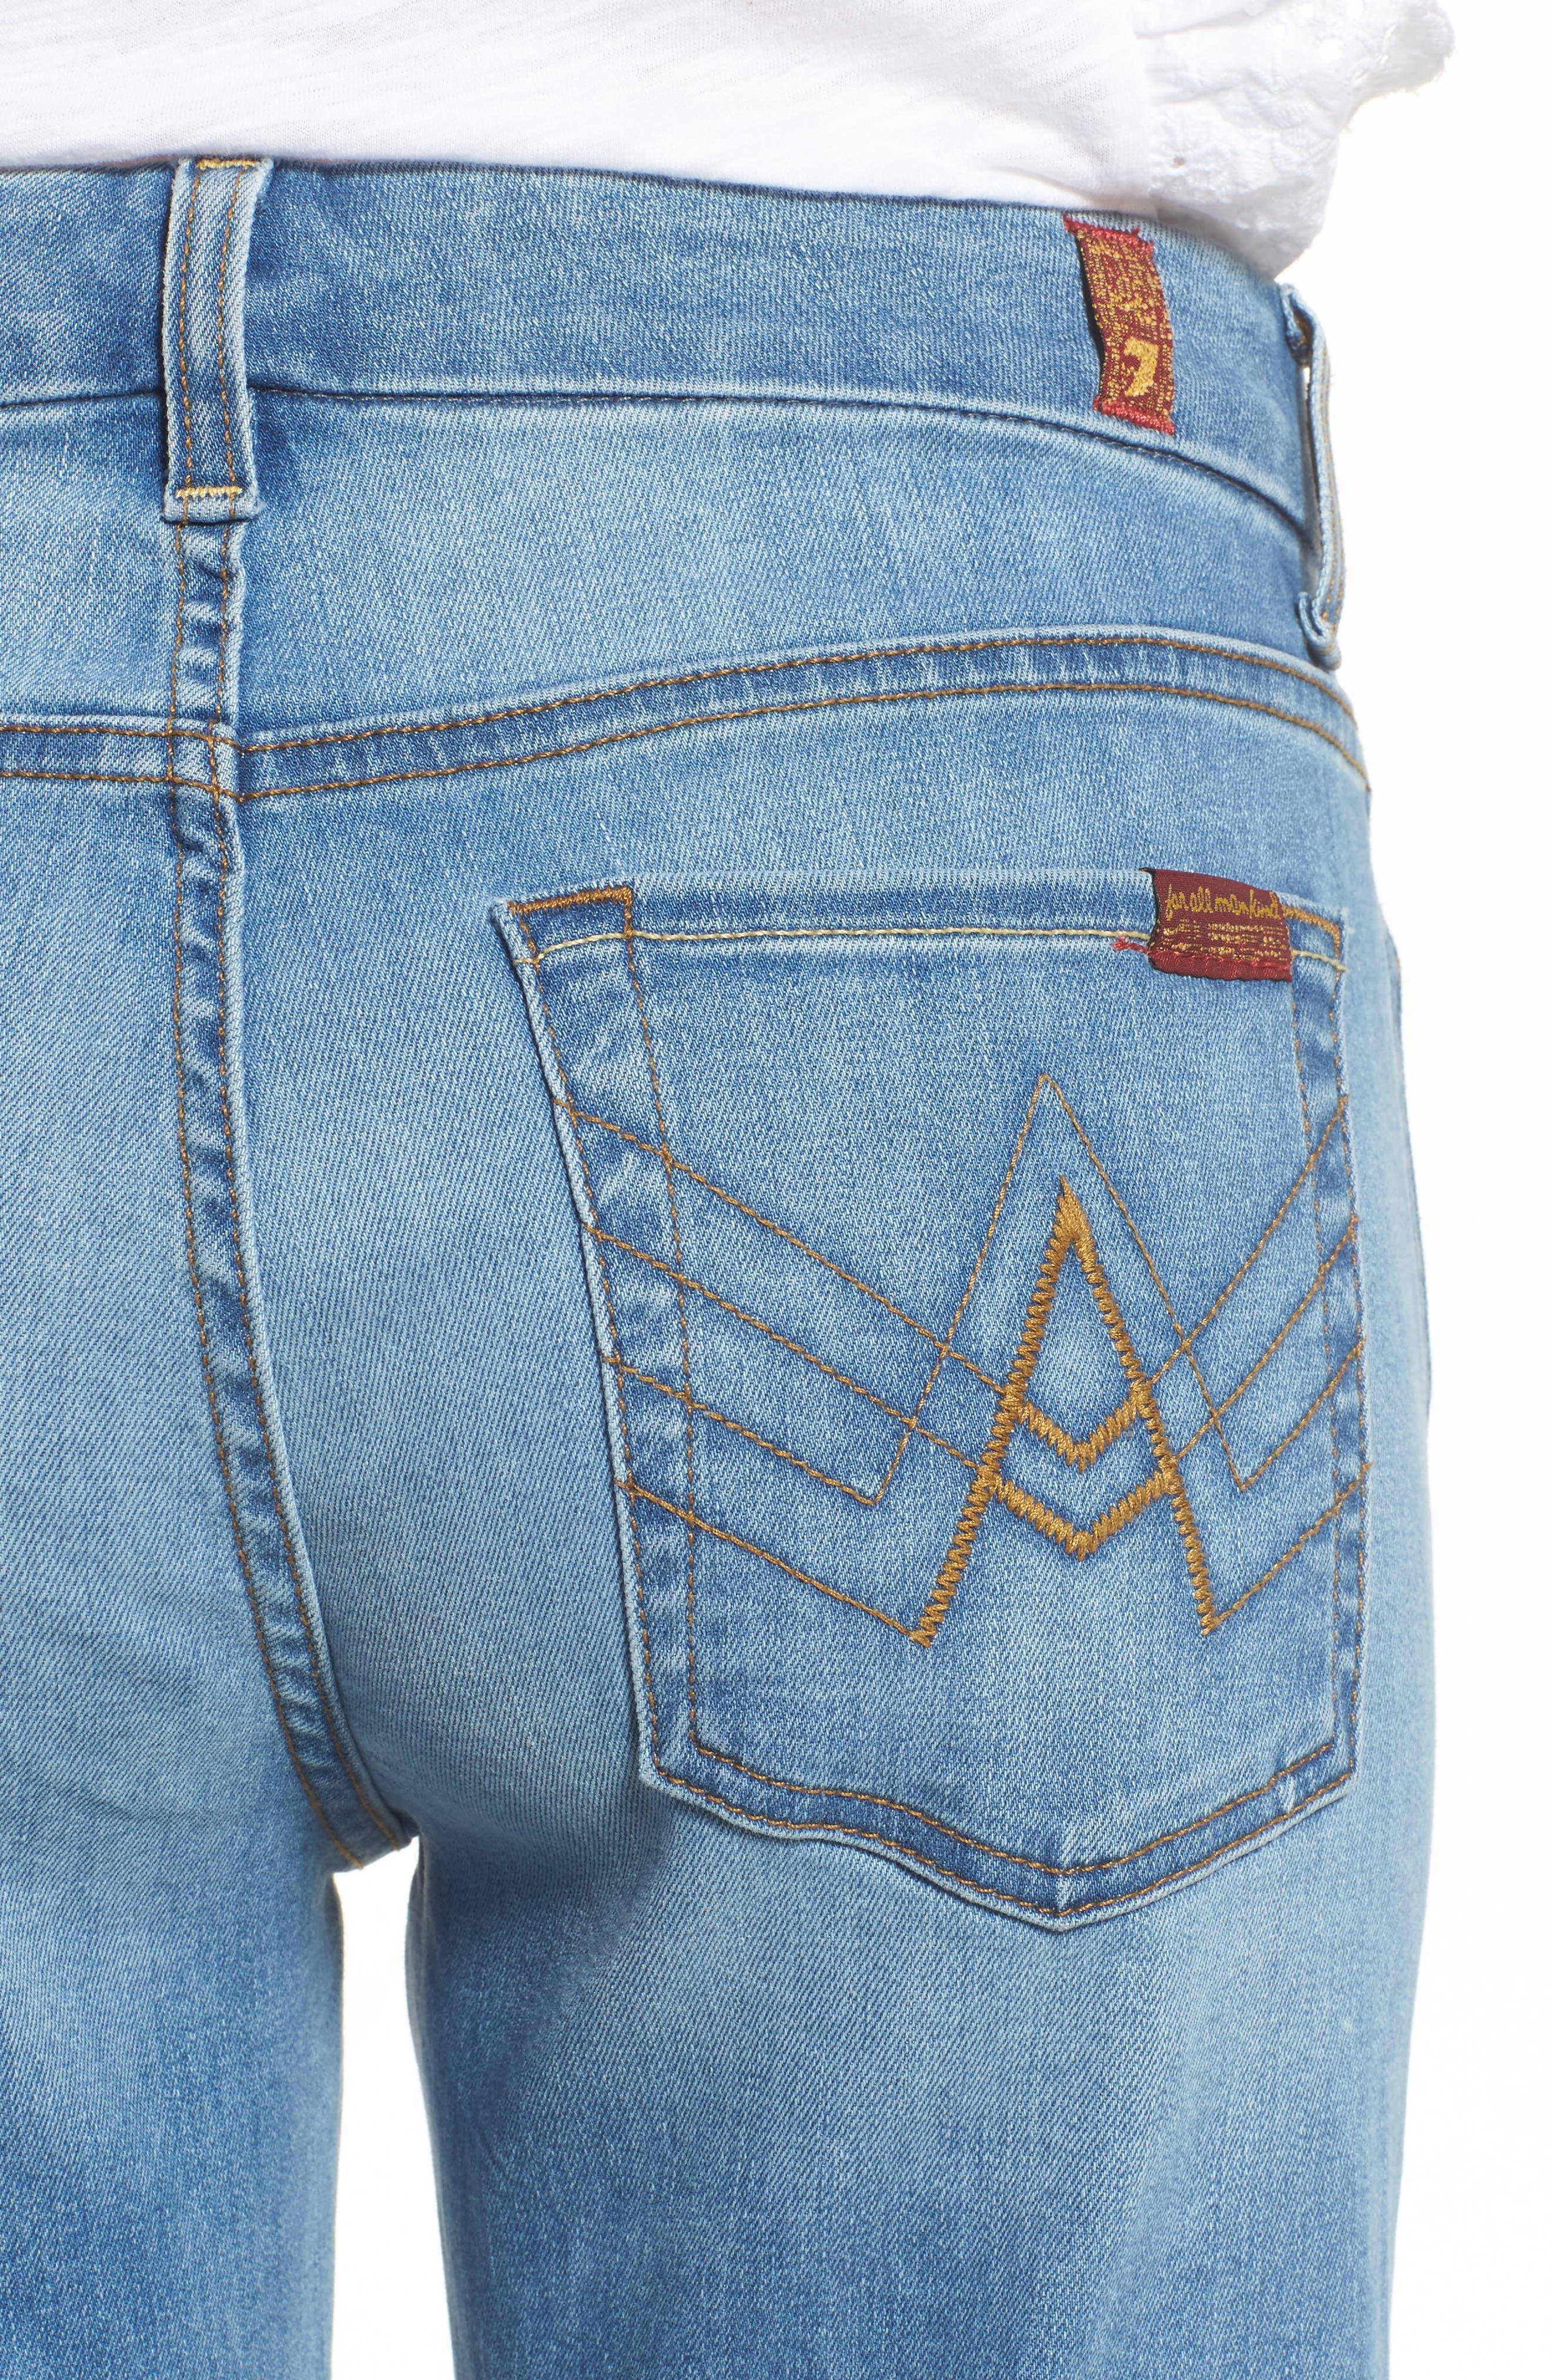 A-Pocket Flare Leg Jeans,                             Alternate thumbnail 4, color,                             Bright Palms